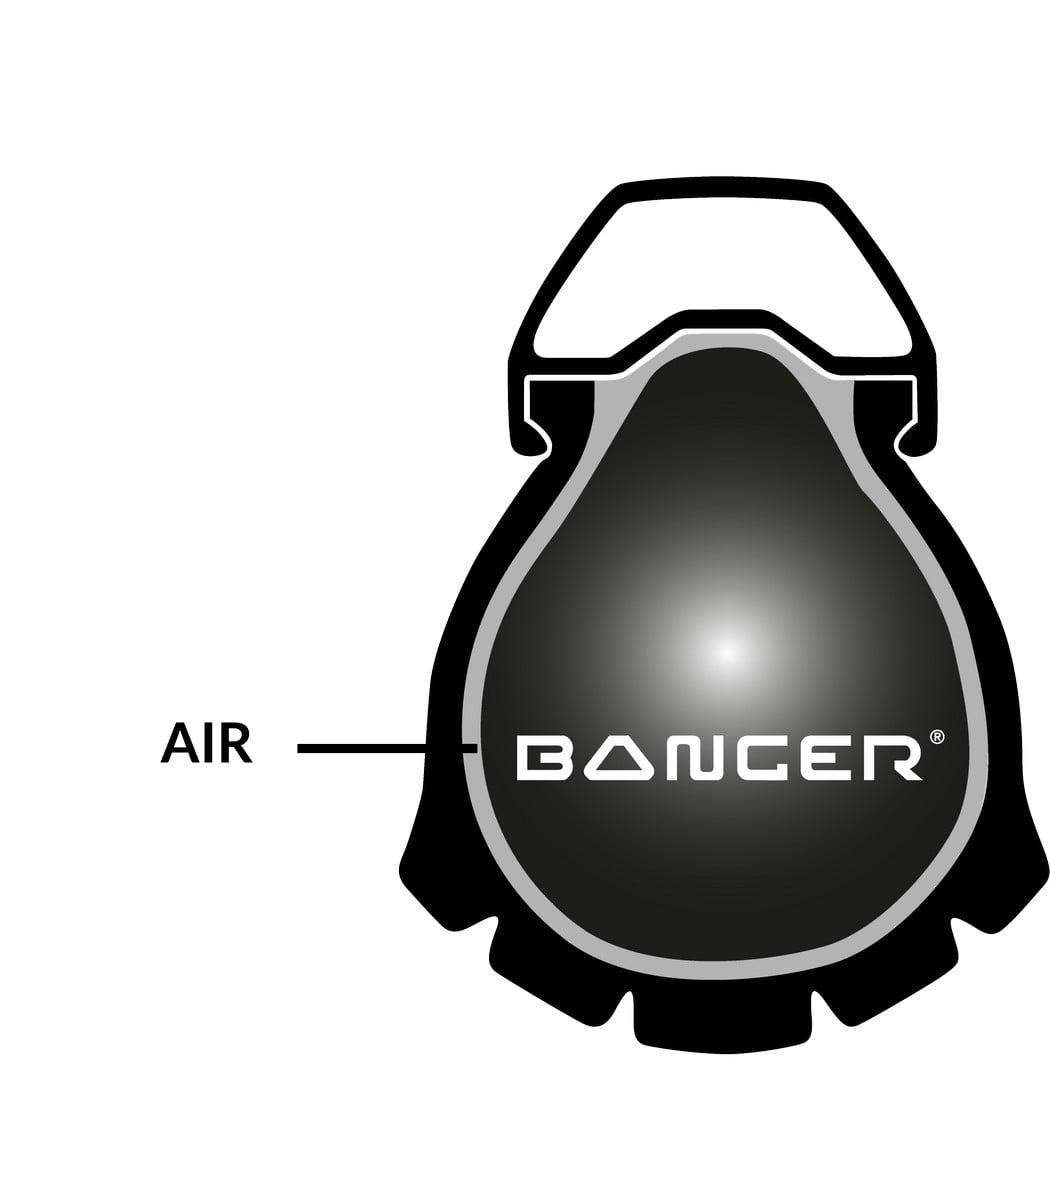 BANGER_SECTION